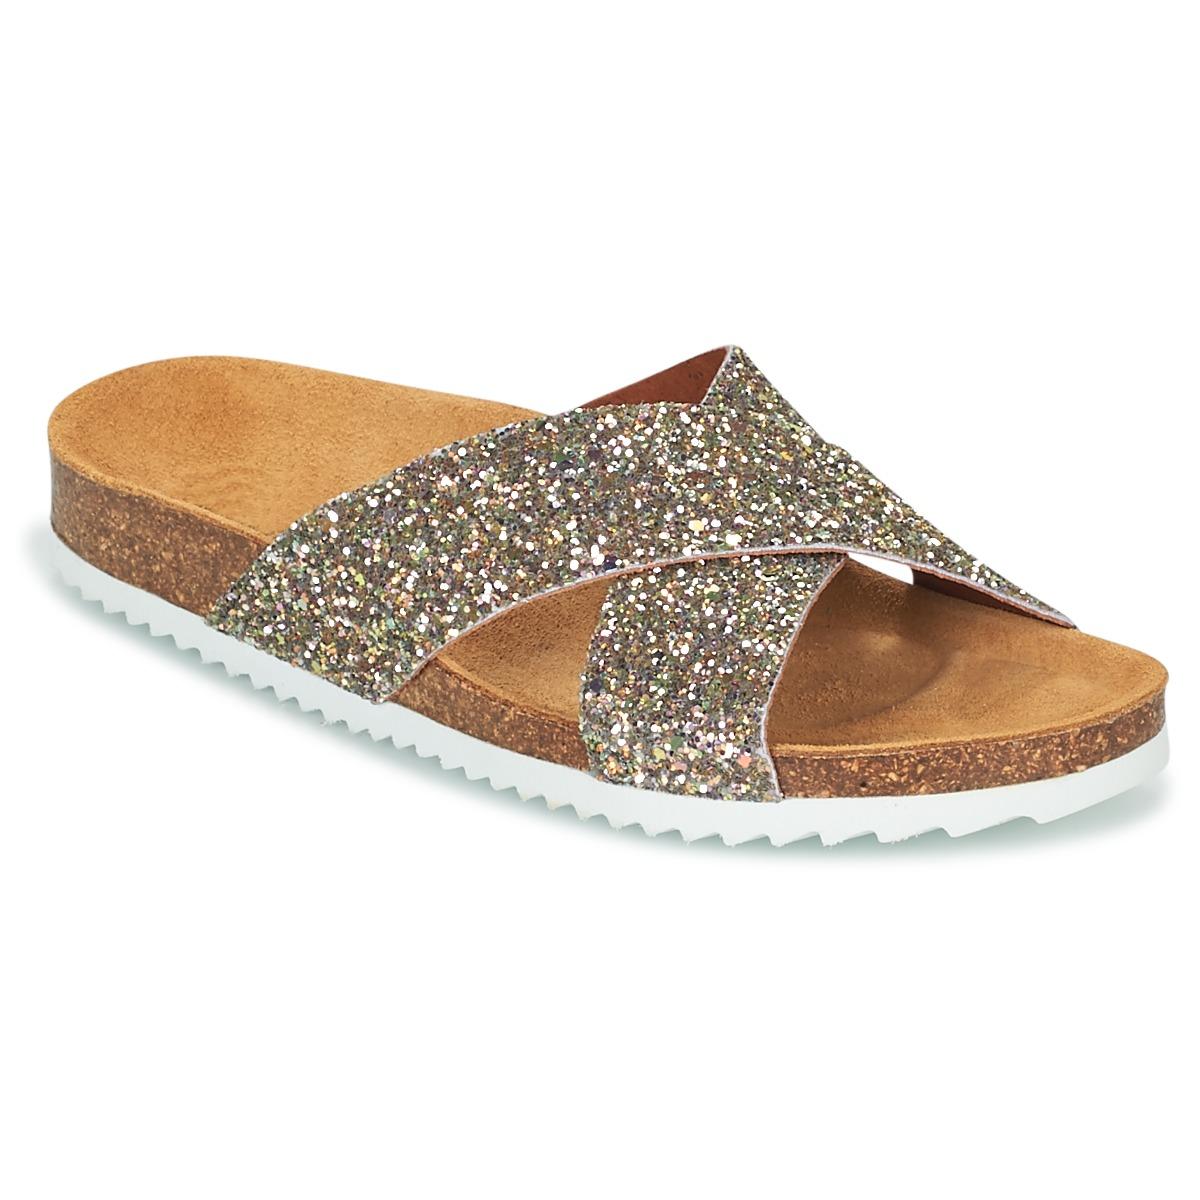 Le Temps des Cerises FALONE Glitterfarbe - Kostenloser Versand bei Spartoode ! - Schuhe Pantoffel Damen 41,29 €